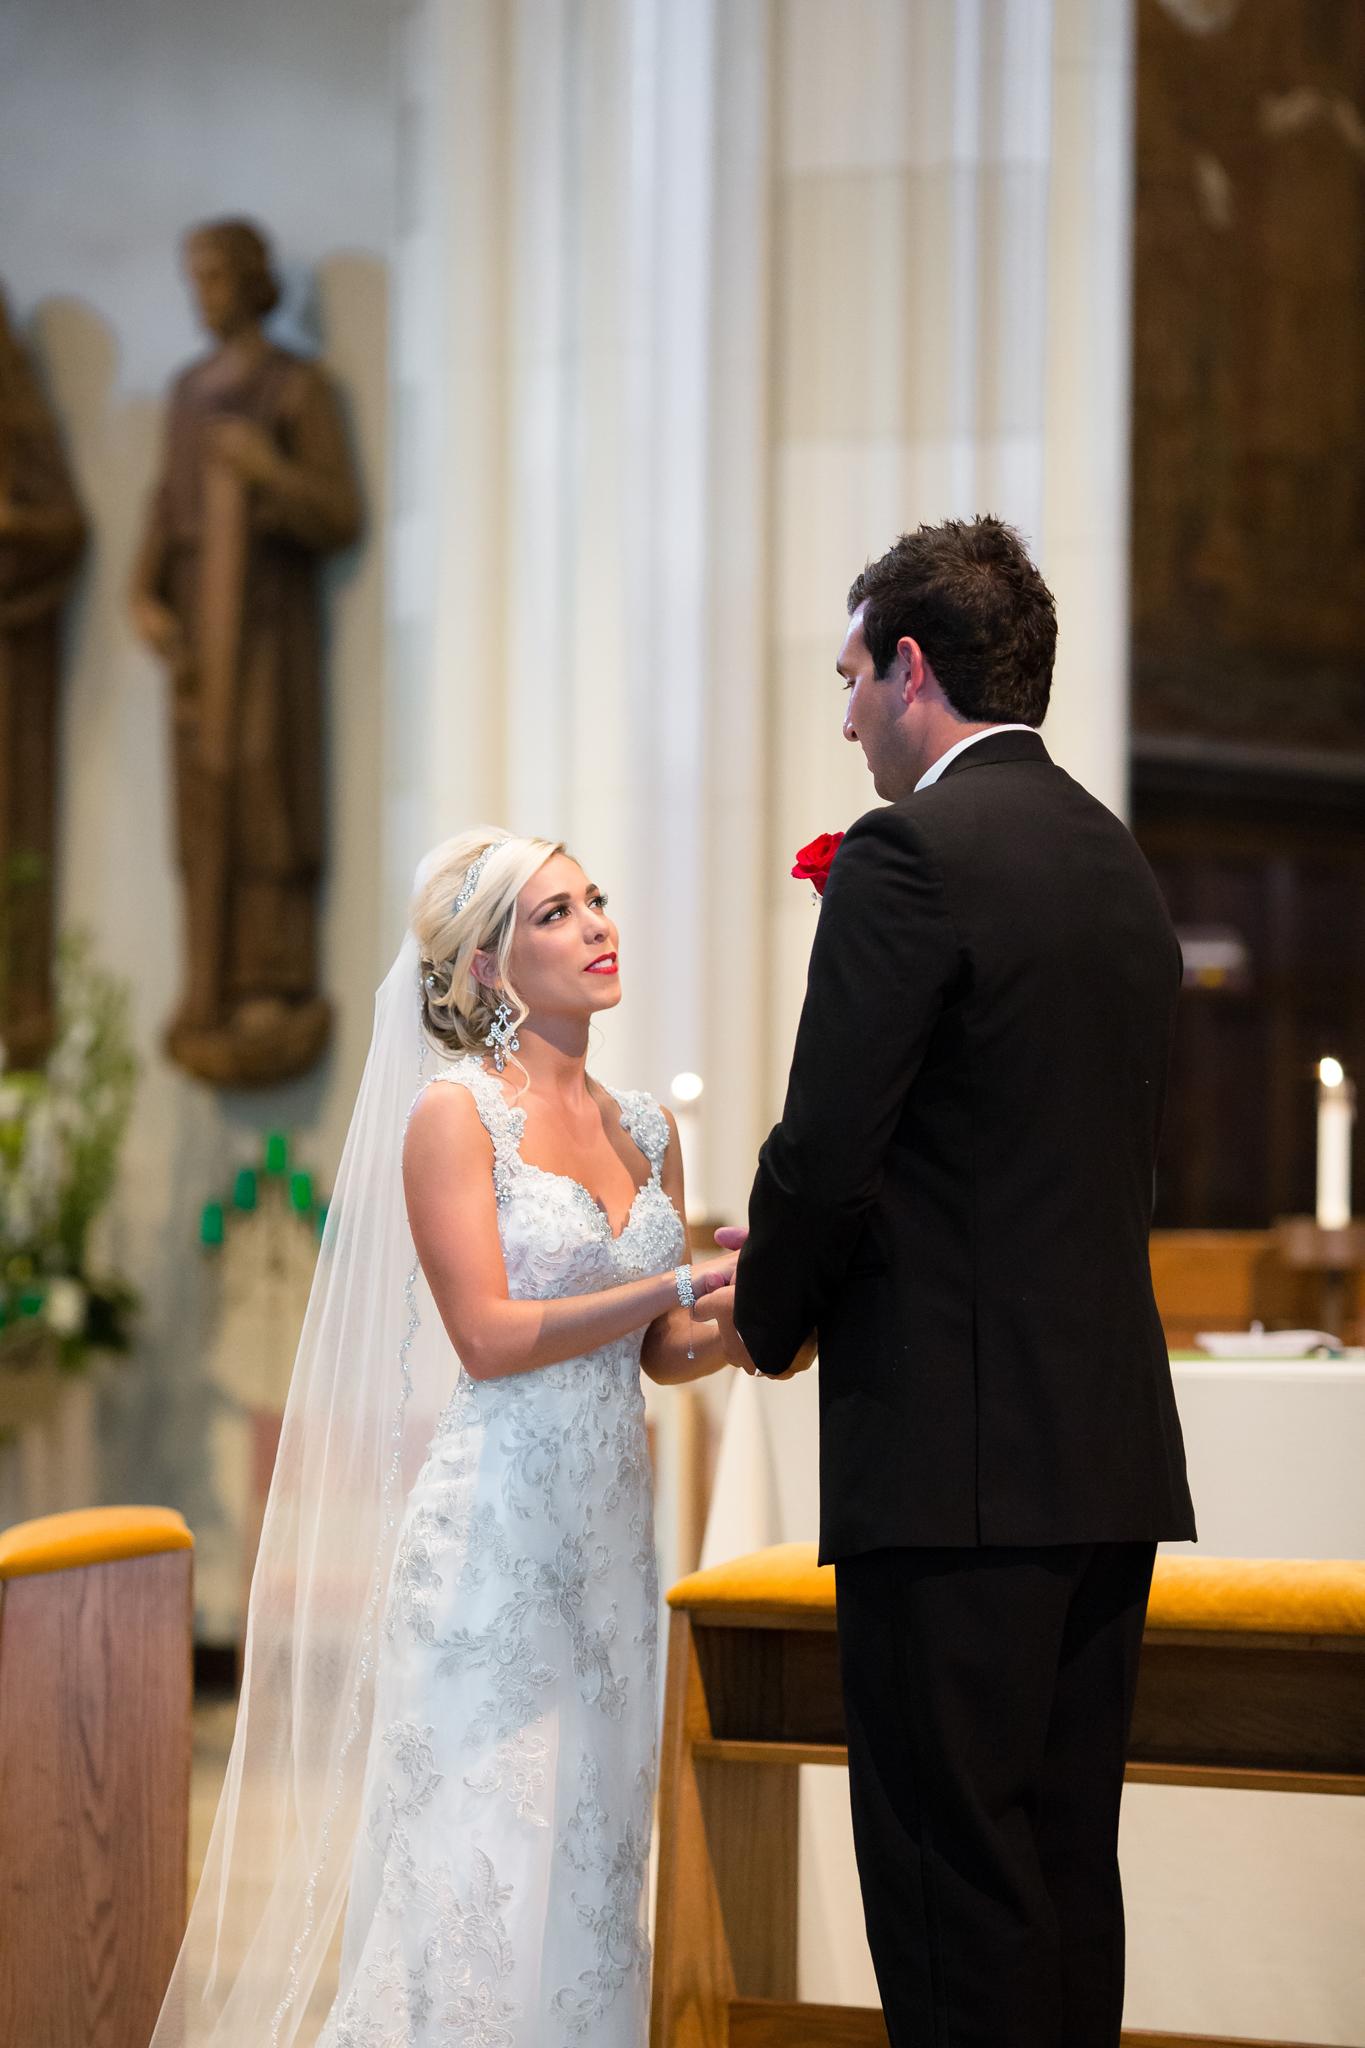 Statler-City-Buffalo-wedding-photographer- 0221.jpg